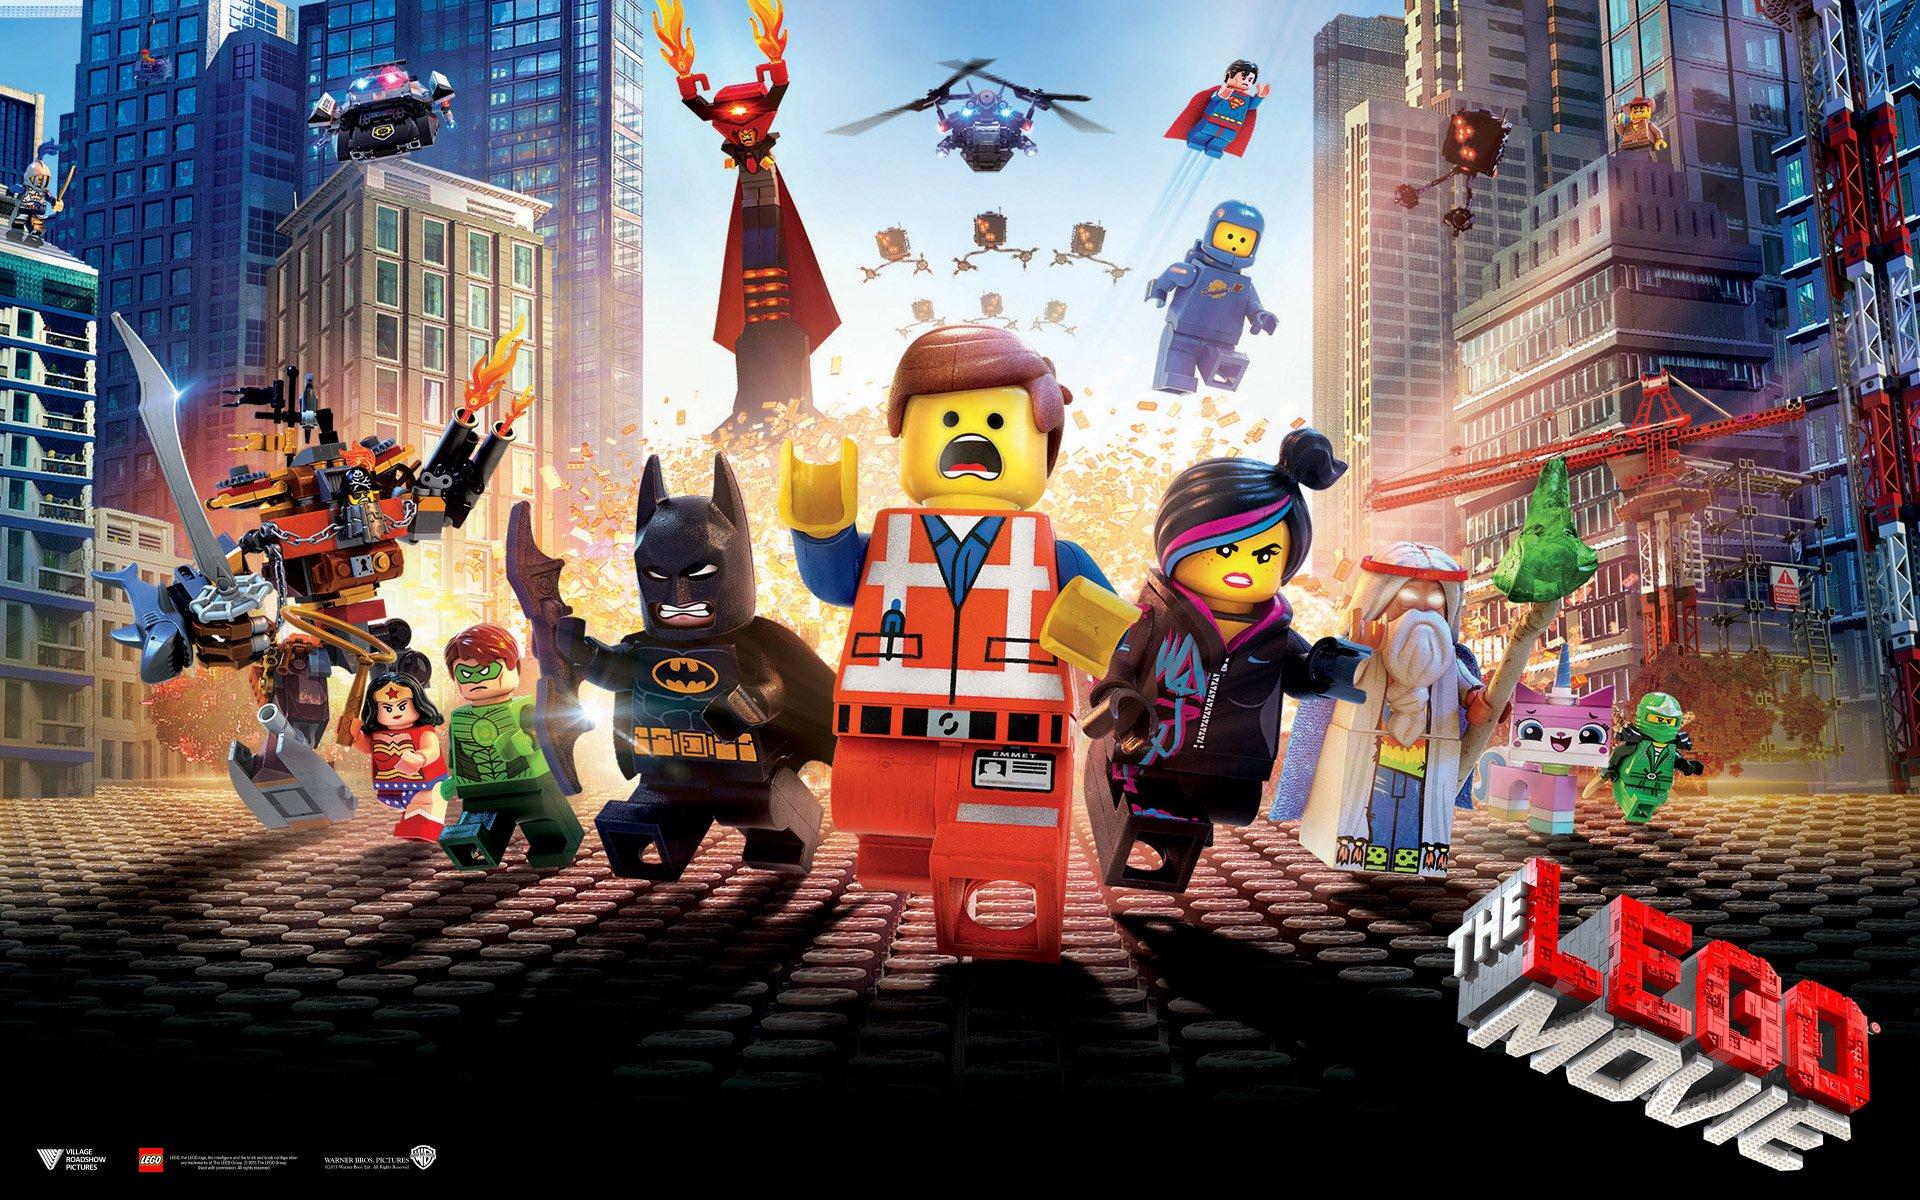 Hd Wallpaper - Lego Movie Wallpaper Hd , HD Wallpaper & Backgrounds